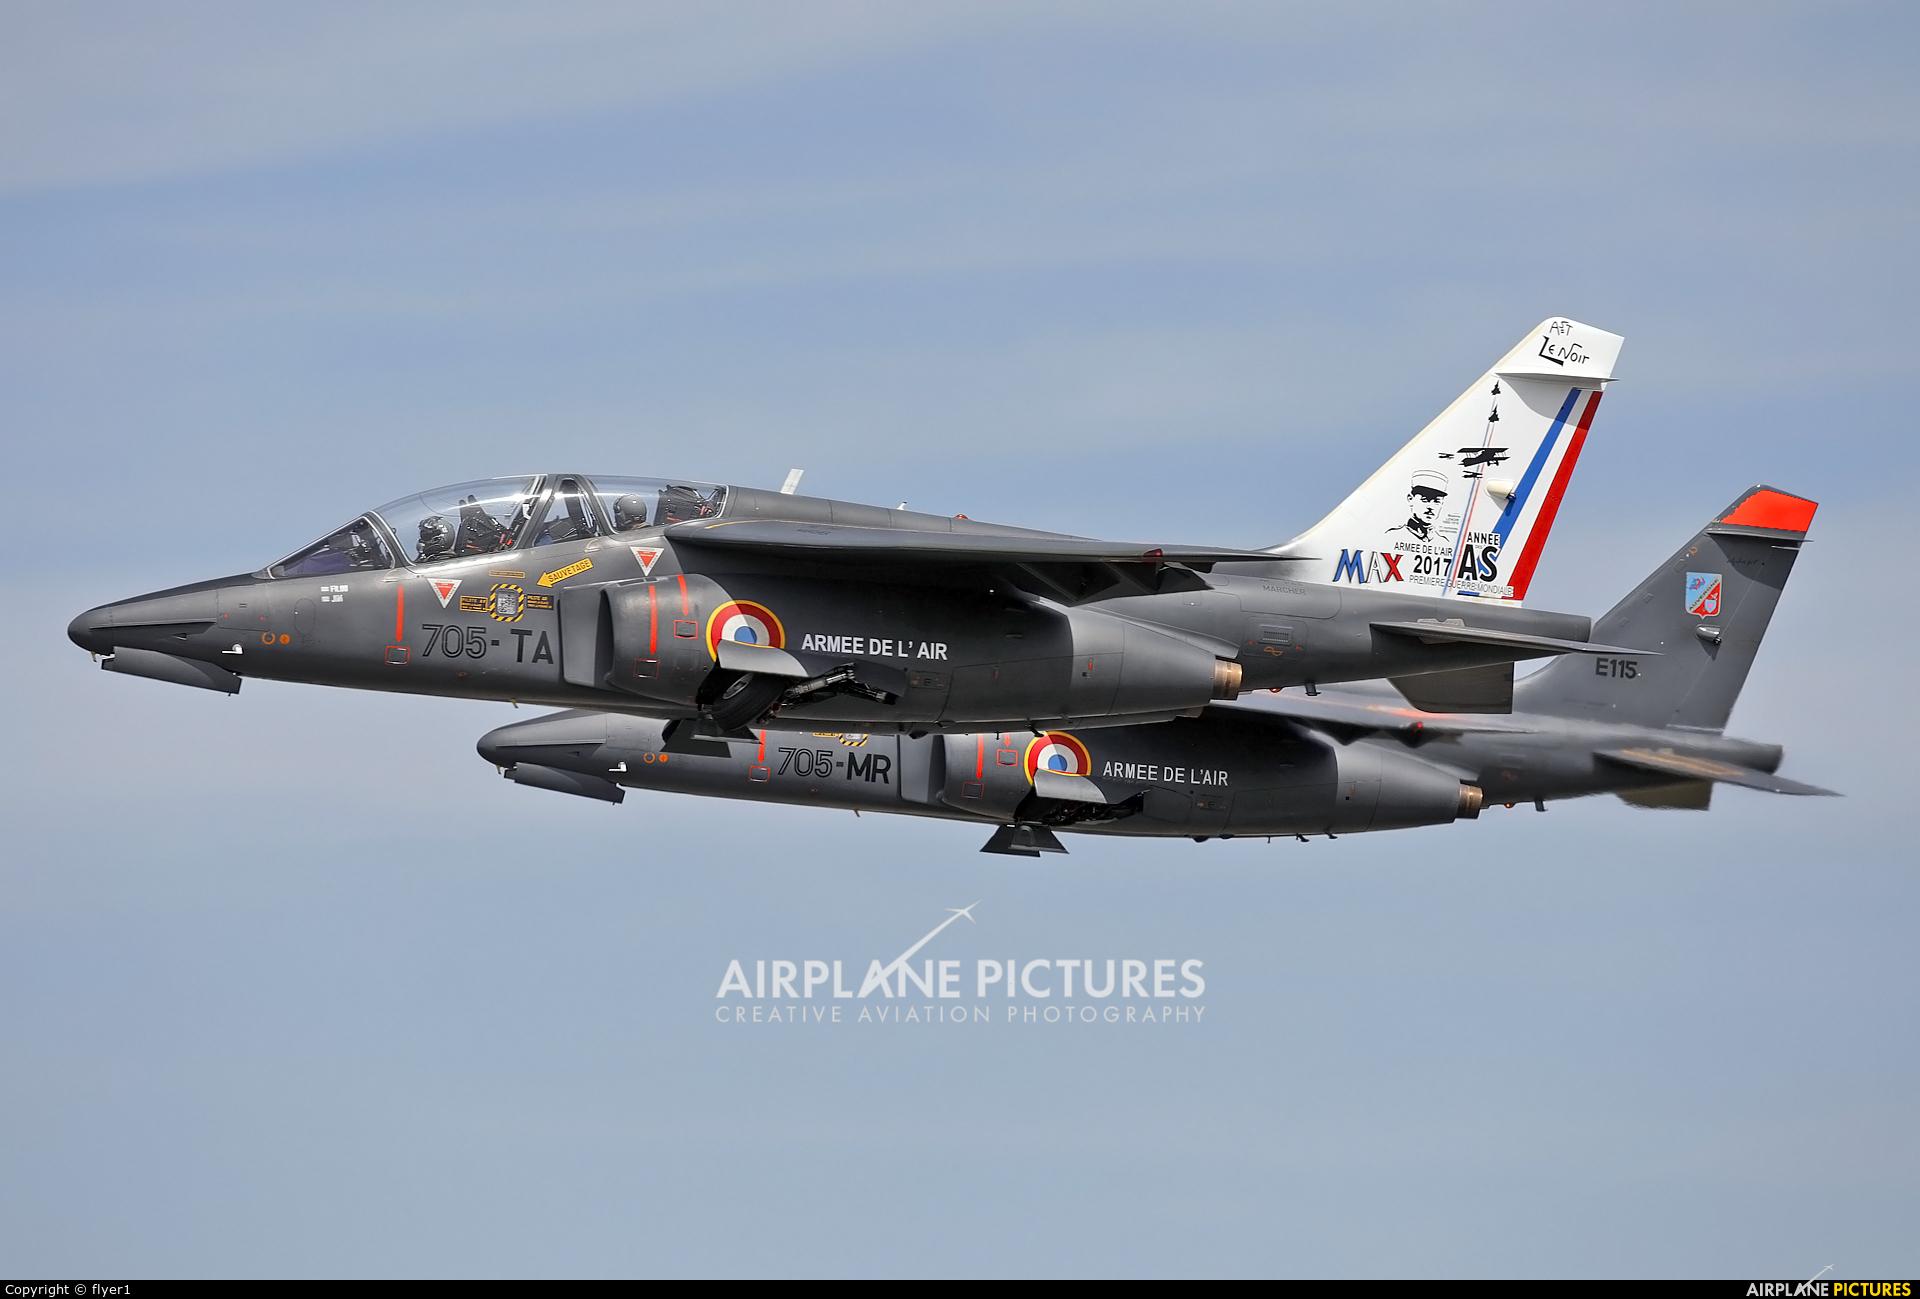 France - Air Force E42 aircraft at Fairford